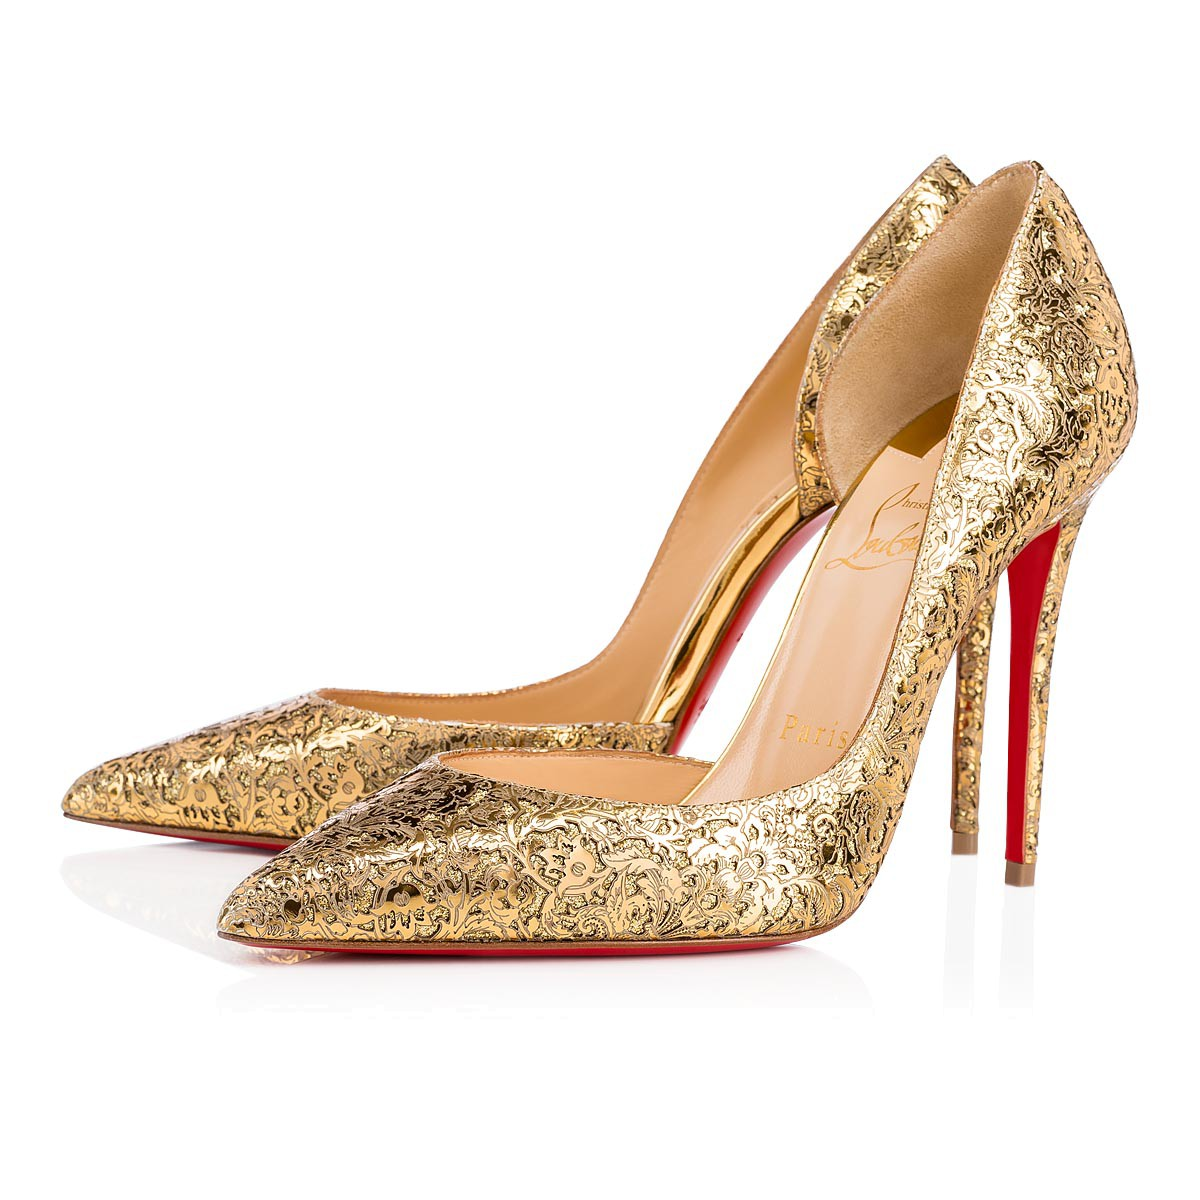 c7f18413c0660 Scarpe con tacco eleganti color oro Christian Louboutin a 745 euro